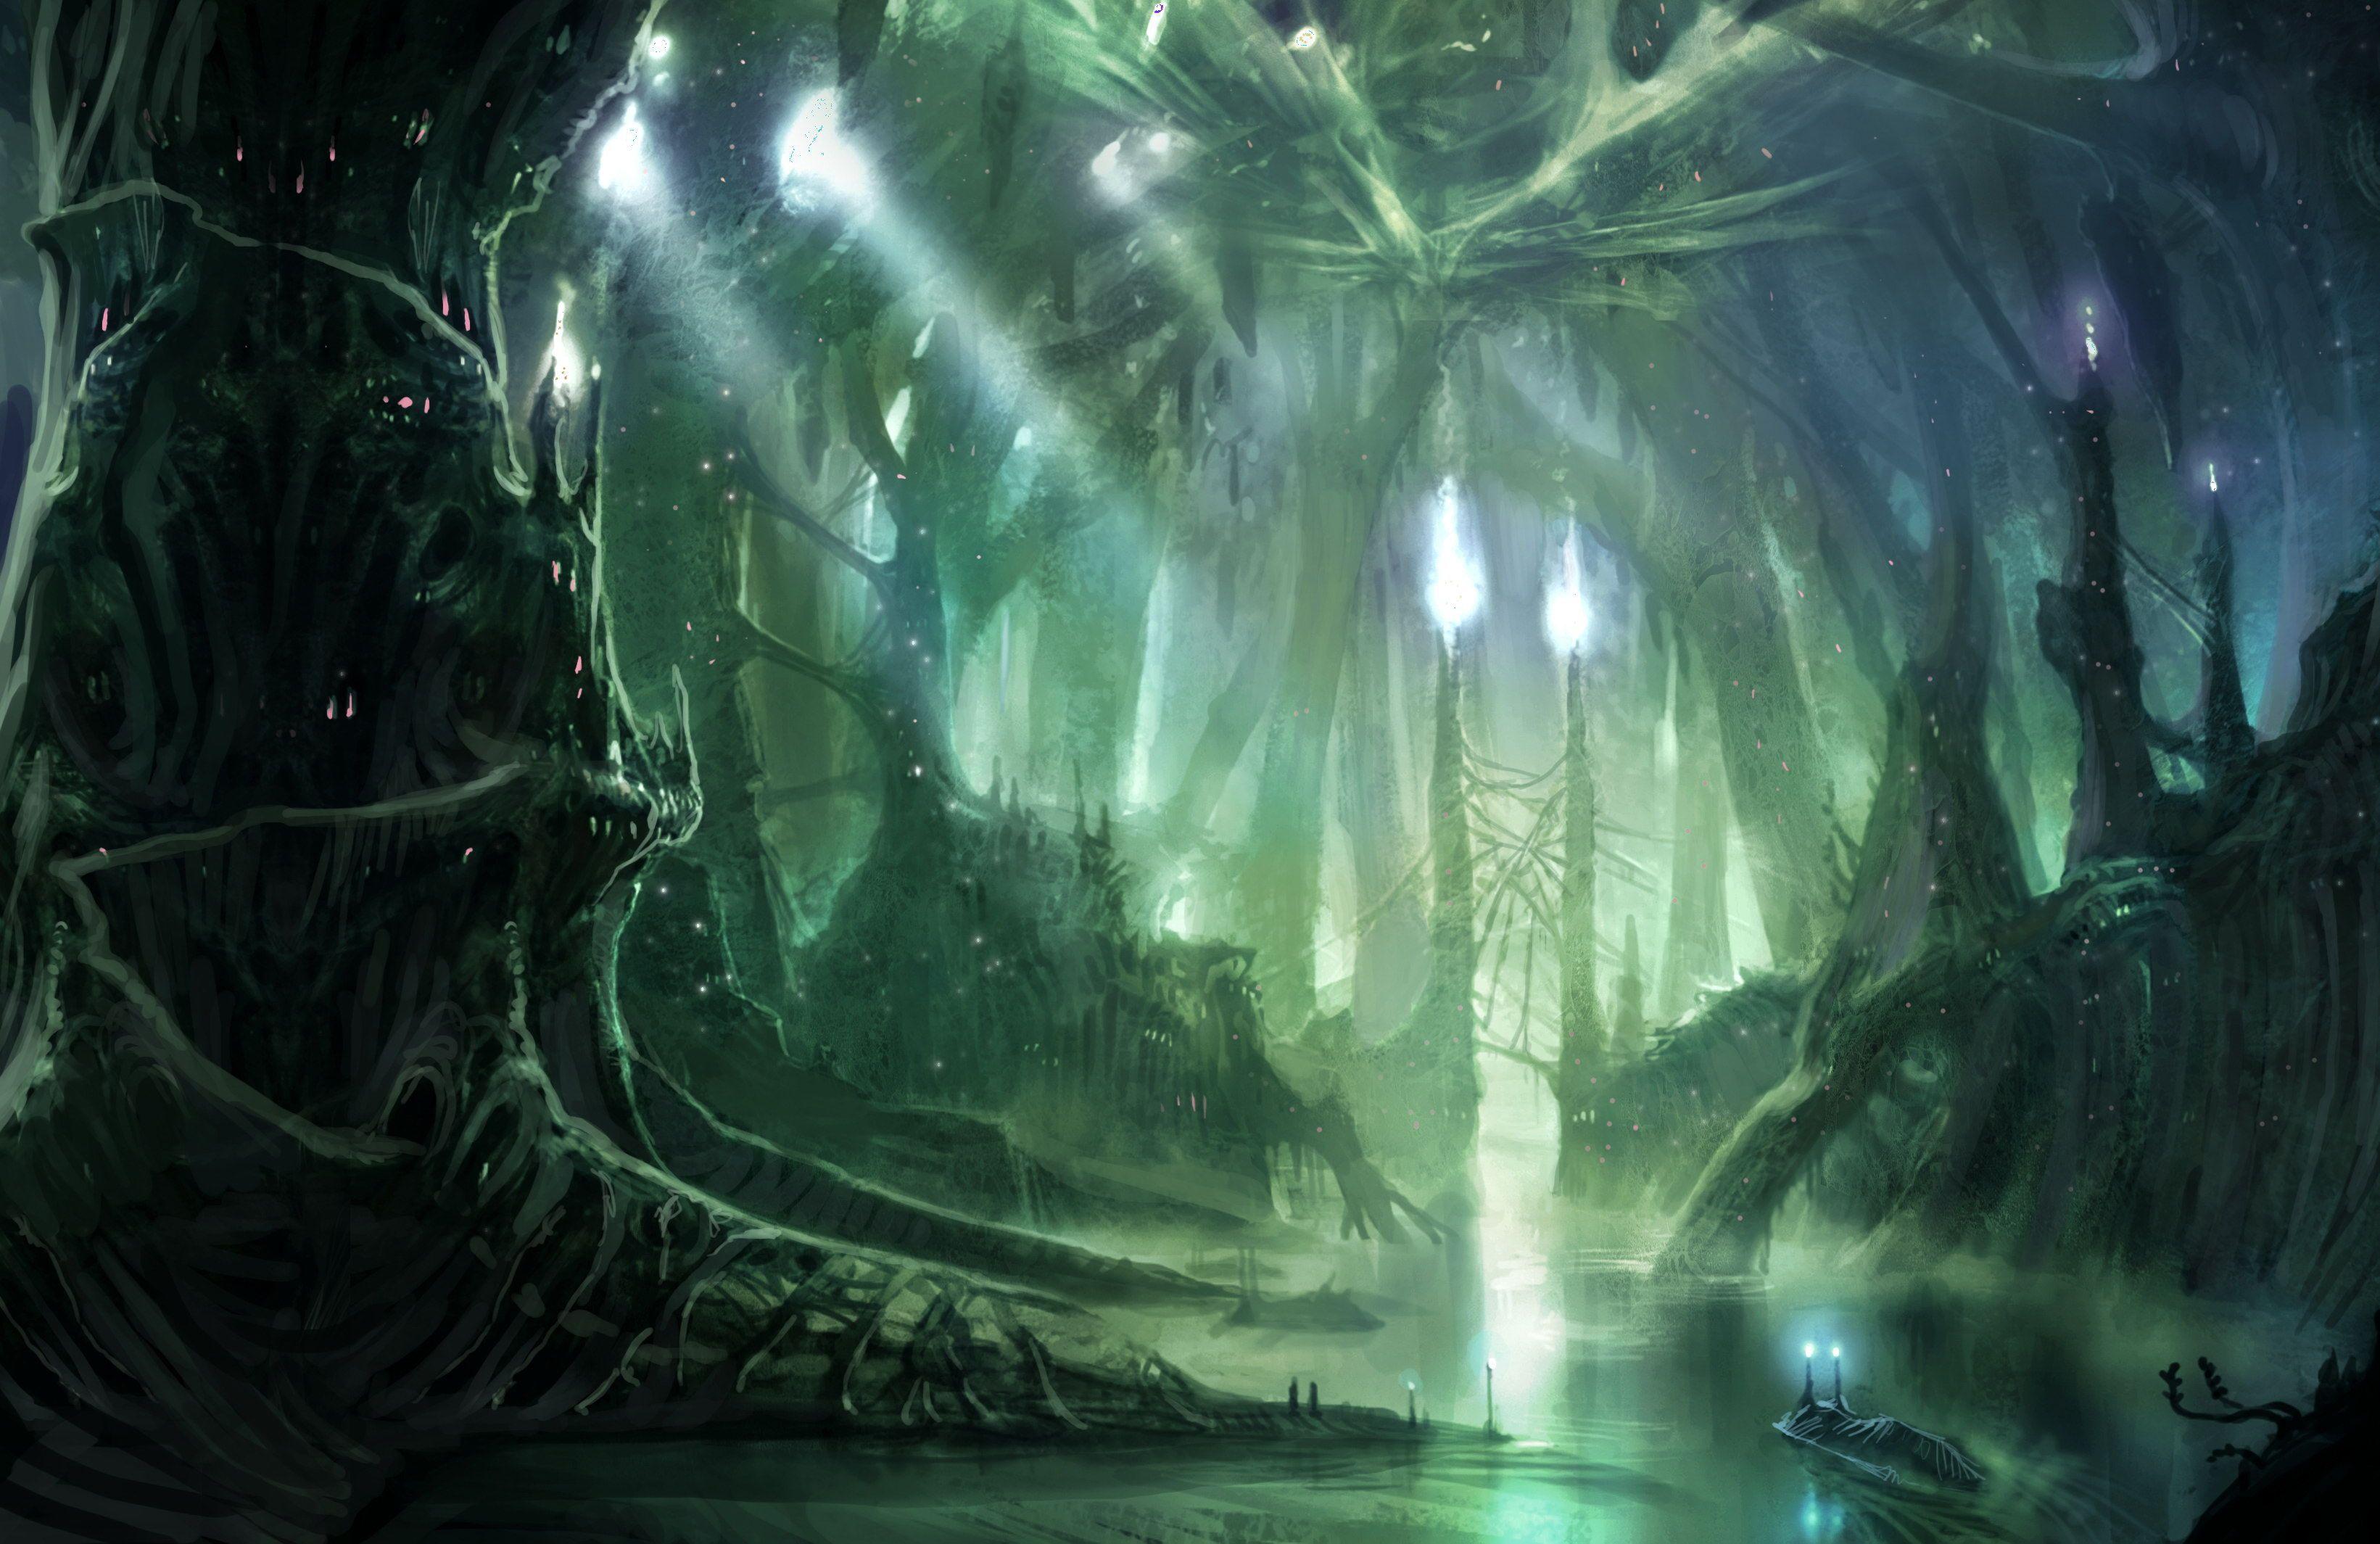 fantasy forest backgrounds | fantasy - forest wallpaper | creative